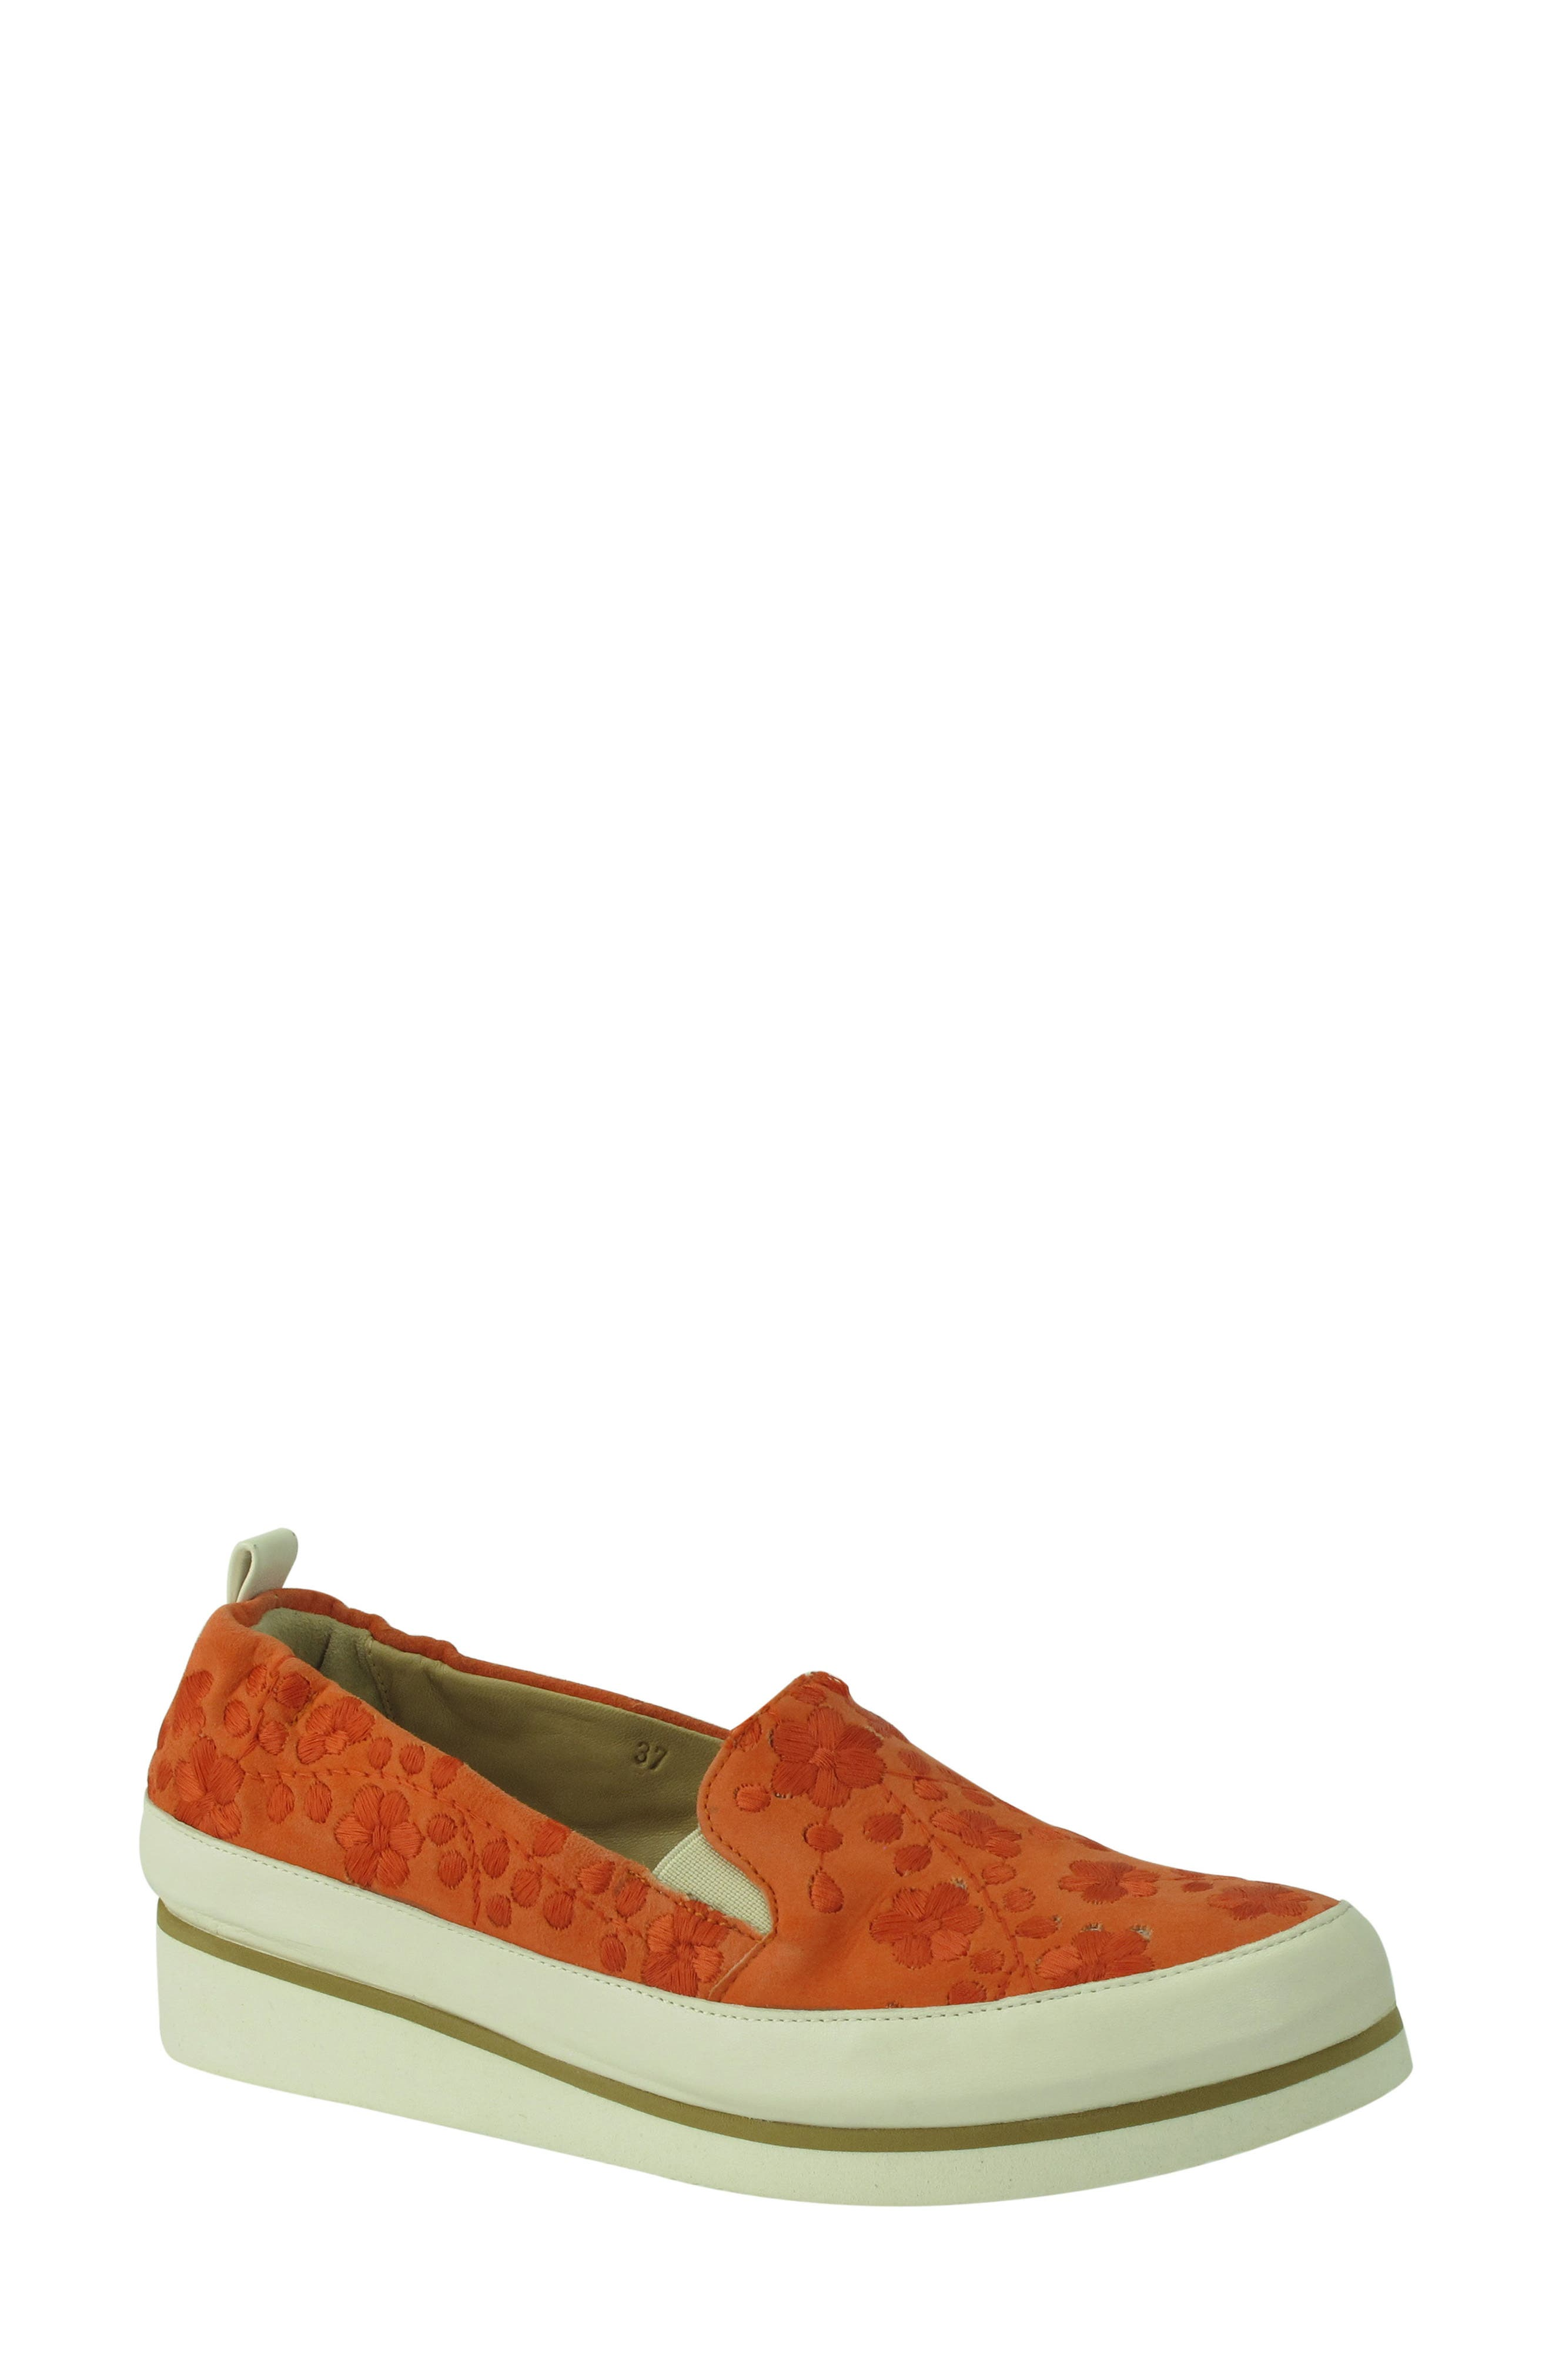 Nell Slip-On Sneaker,                         Main,                         color, Tangerine Suede